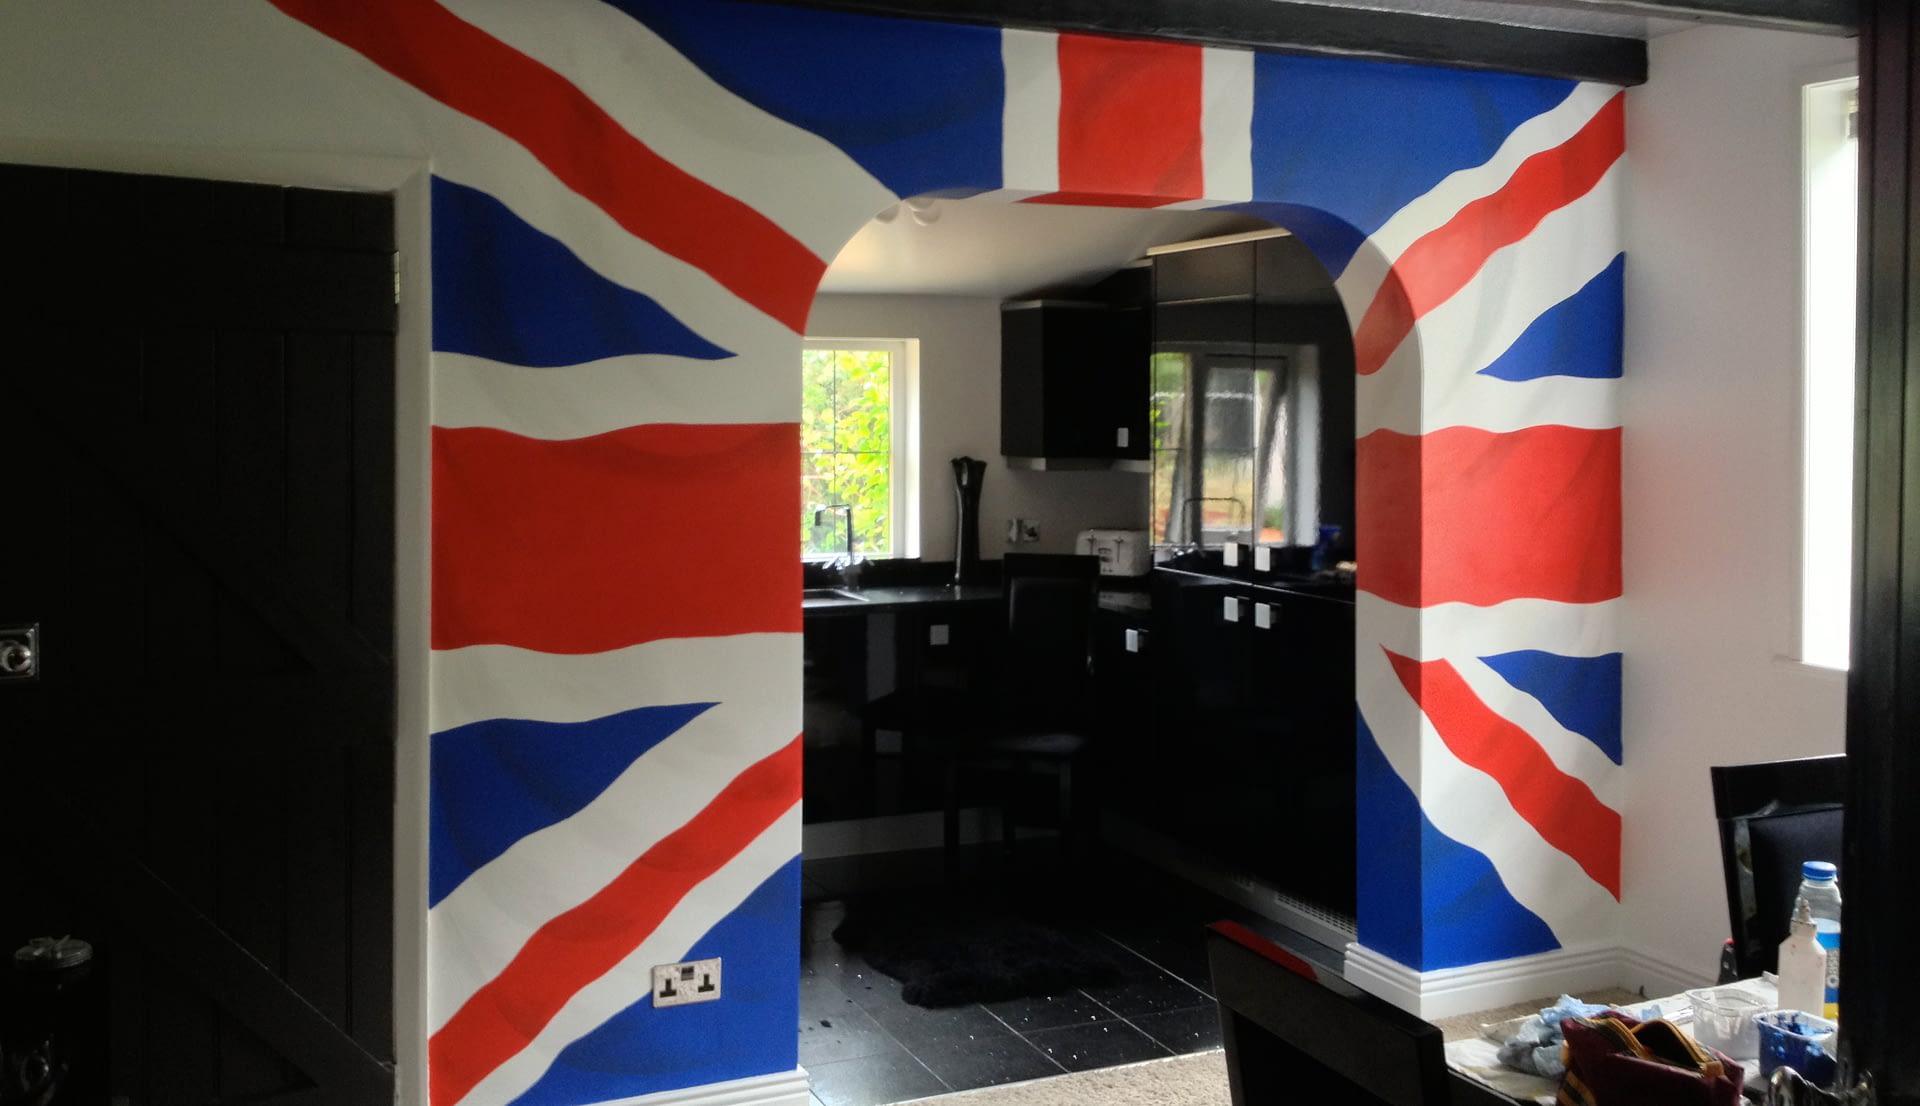 Union Jack Mural